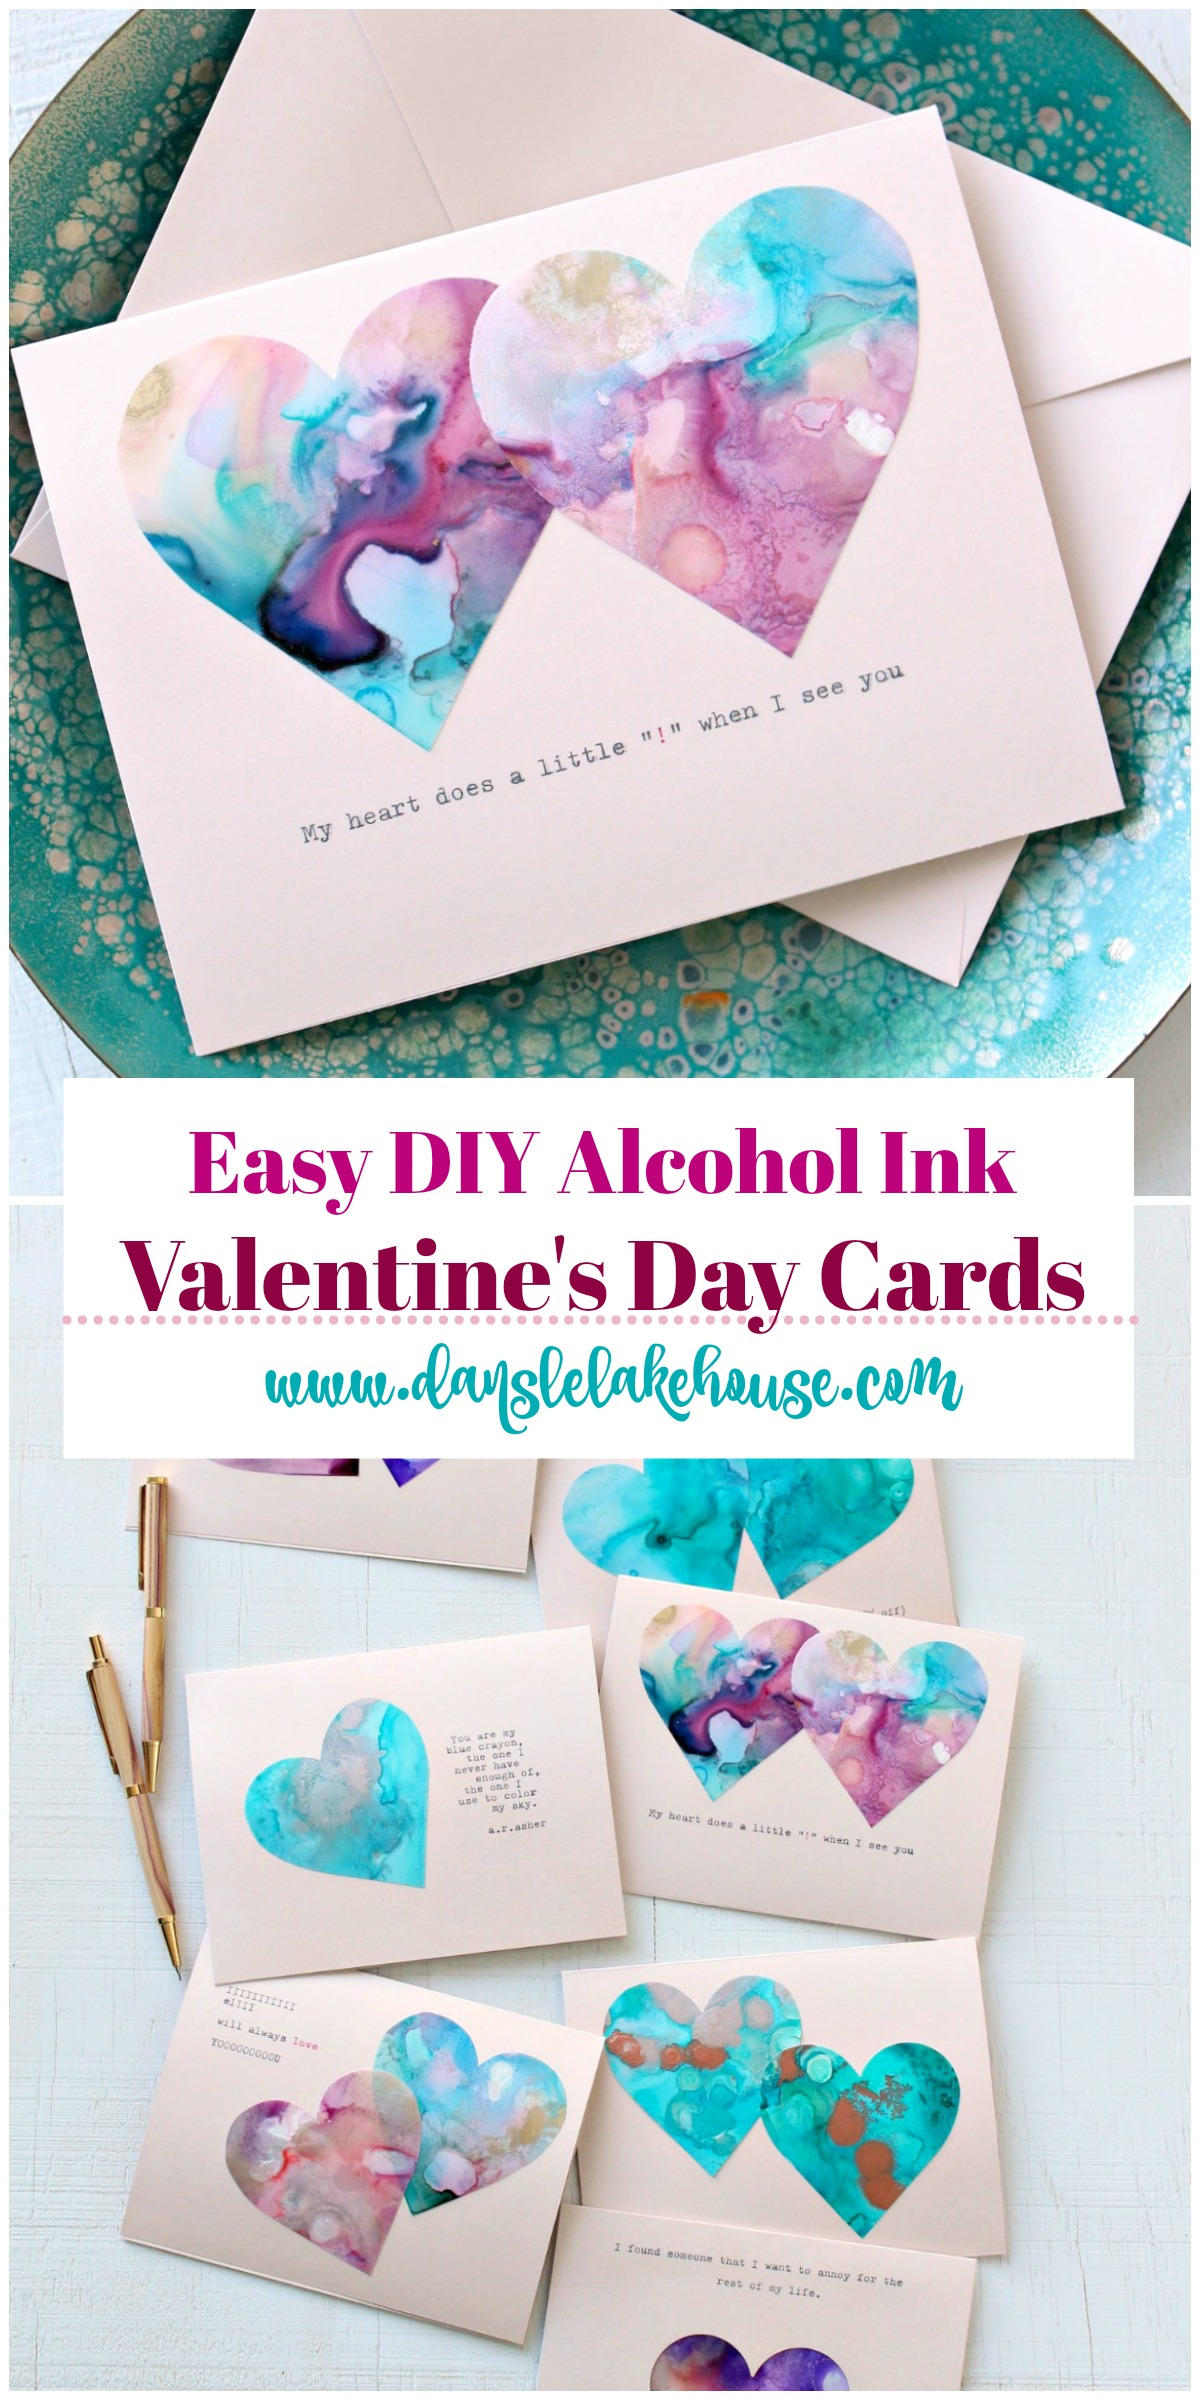 Easy DIY Valentine's Day Card Idea